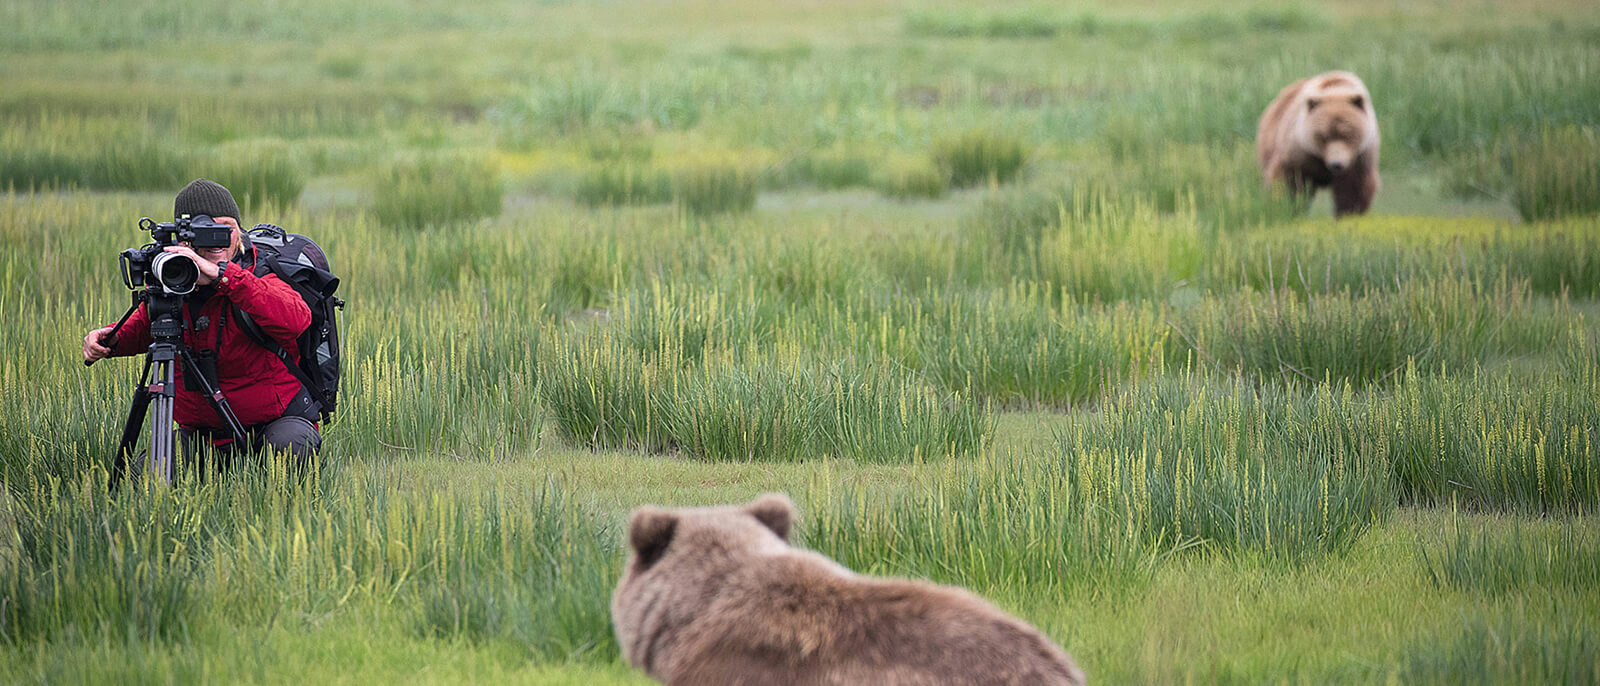 andreas kieling fotografiert oder filmt baeren im hohen grass